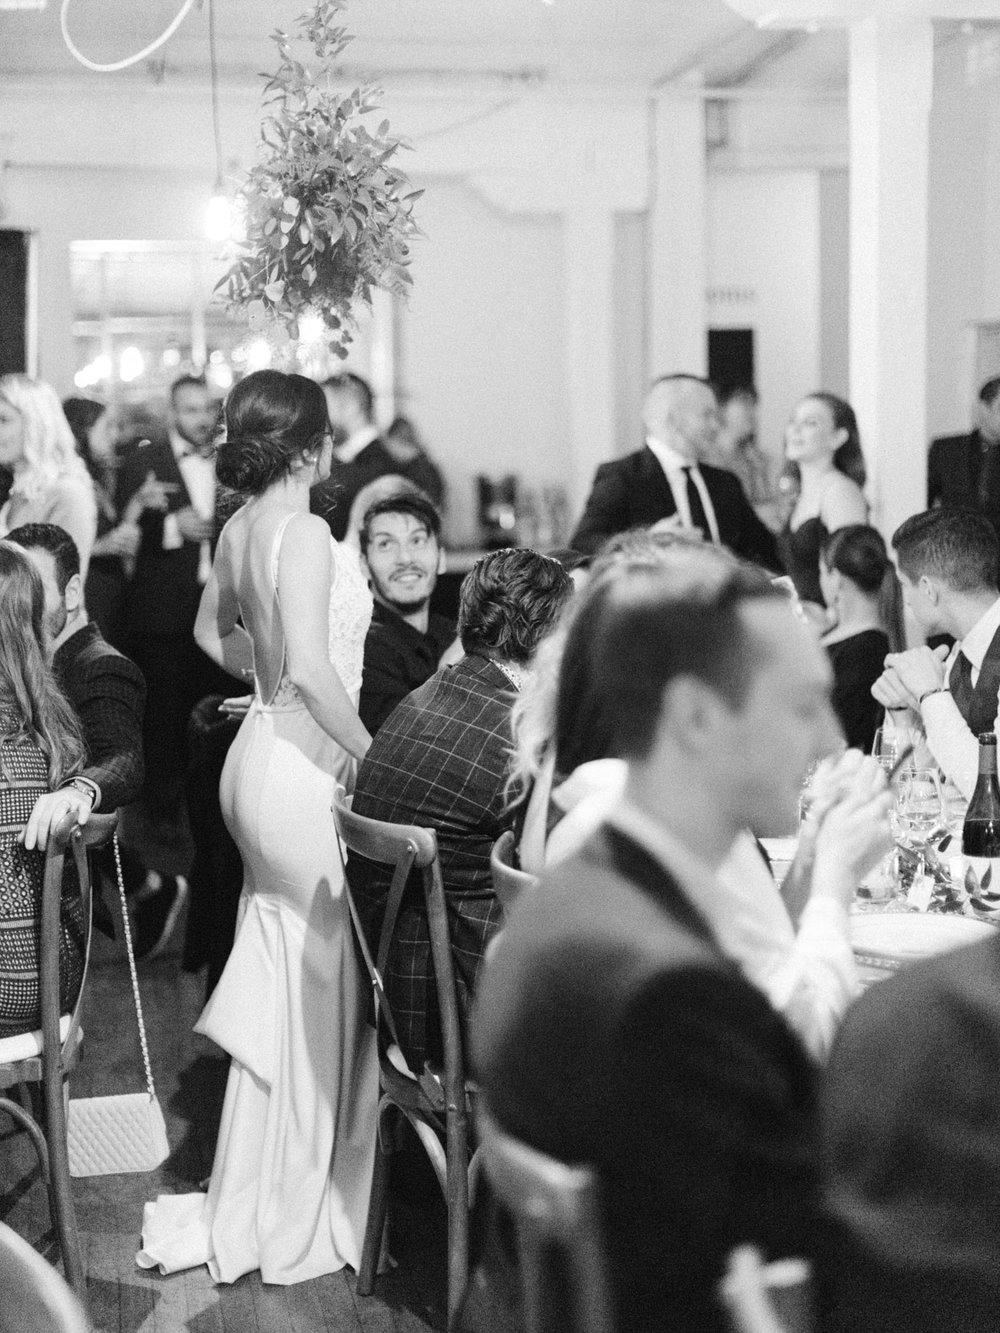 Toronto-wedding-photographer-intimate-italian-the-burroughes-downtown136.jpg